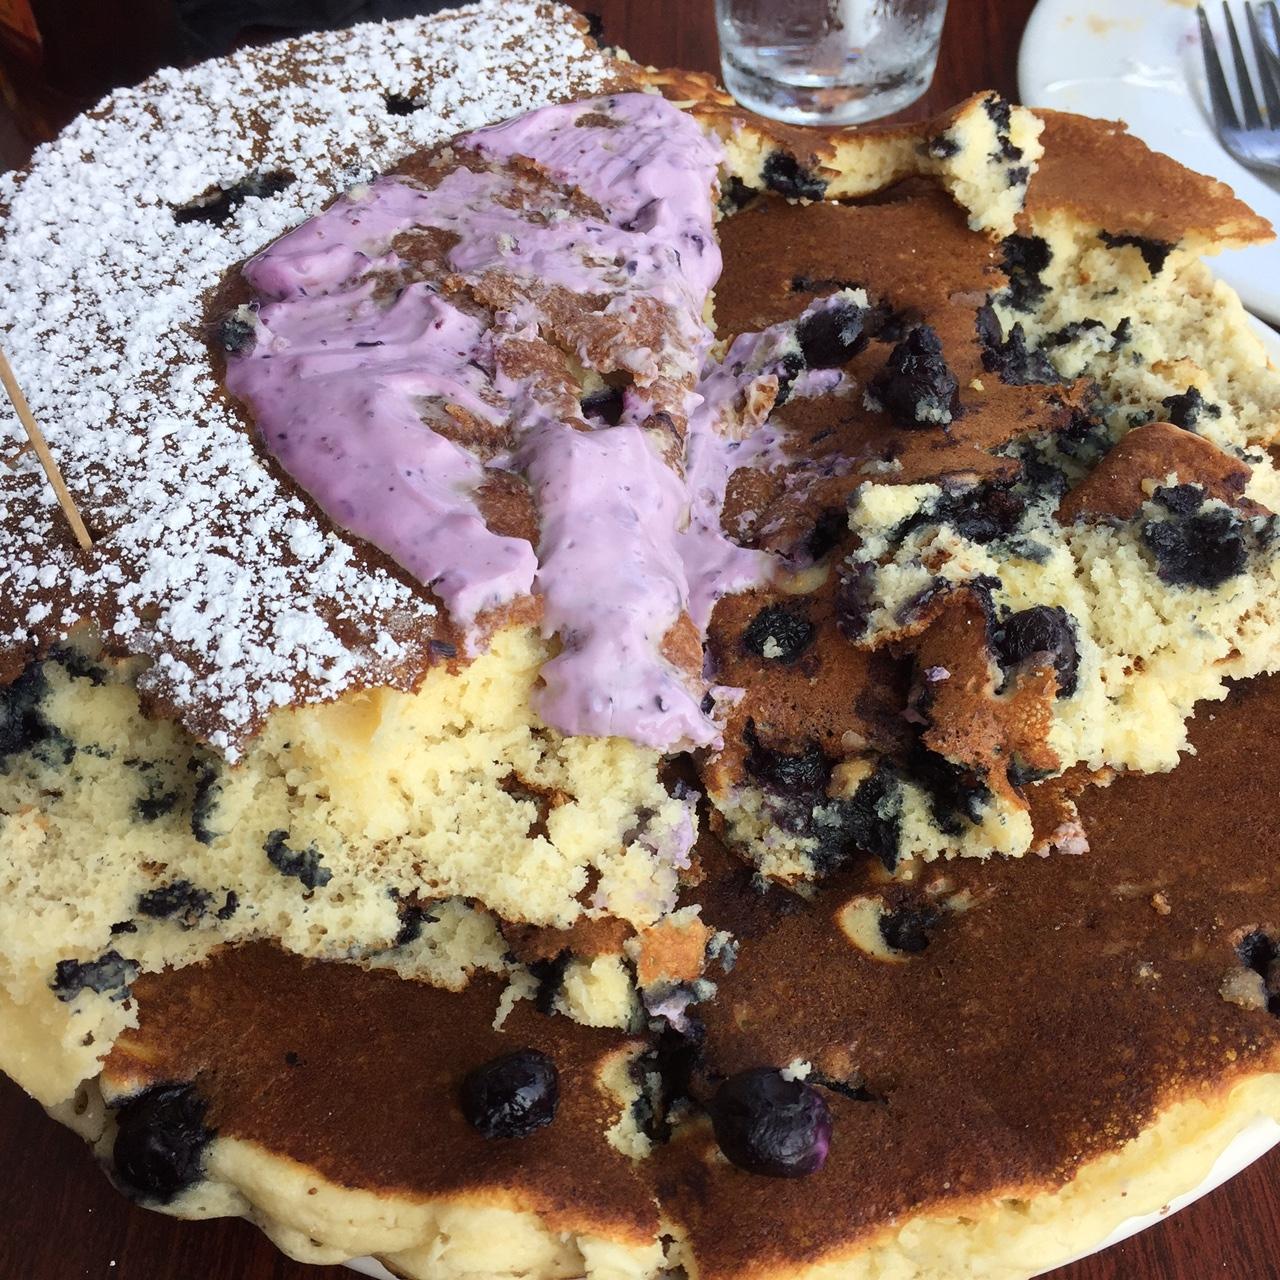 BLUESberry Pancakes